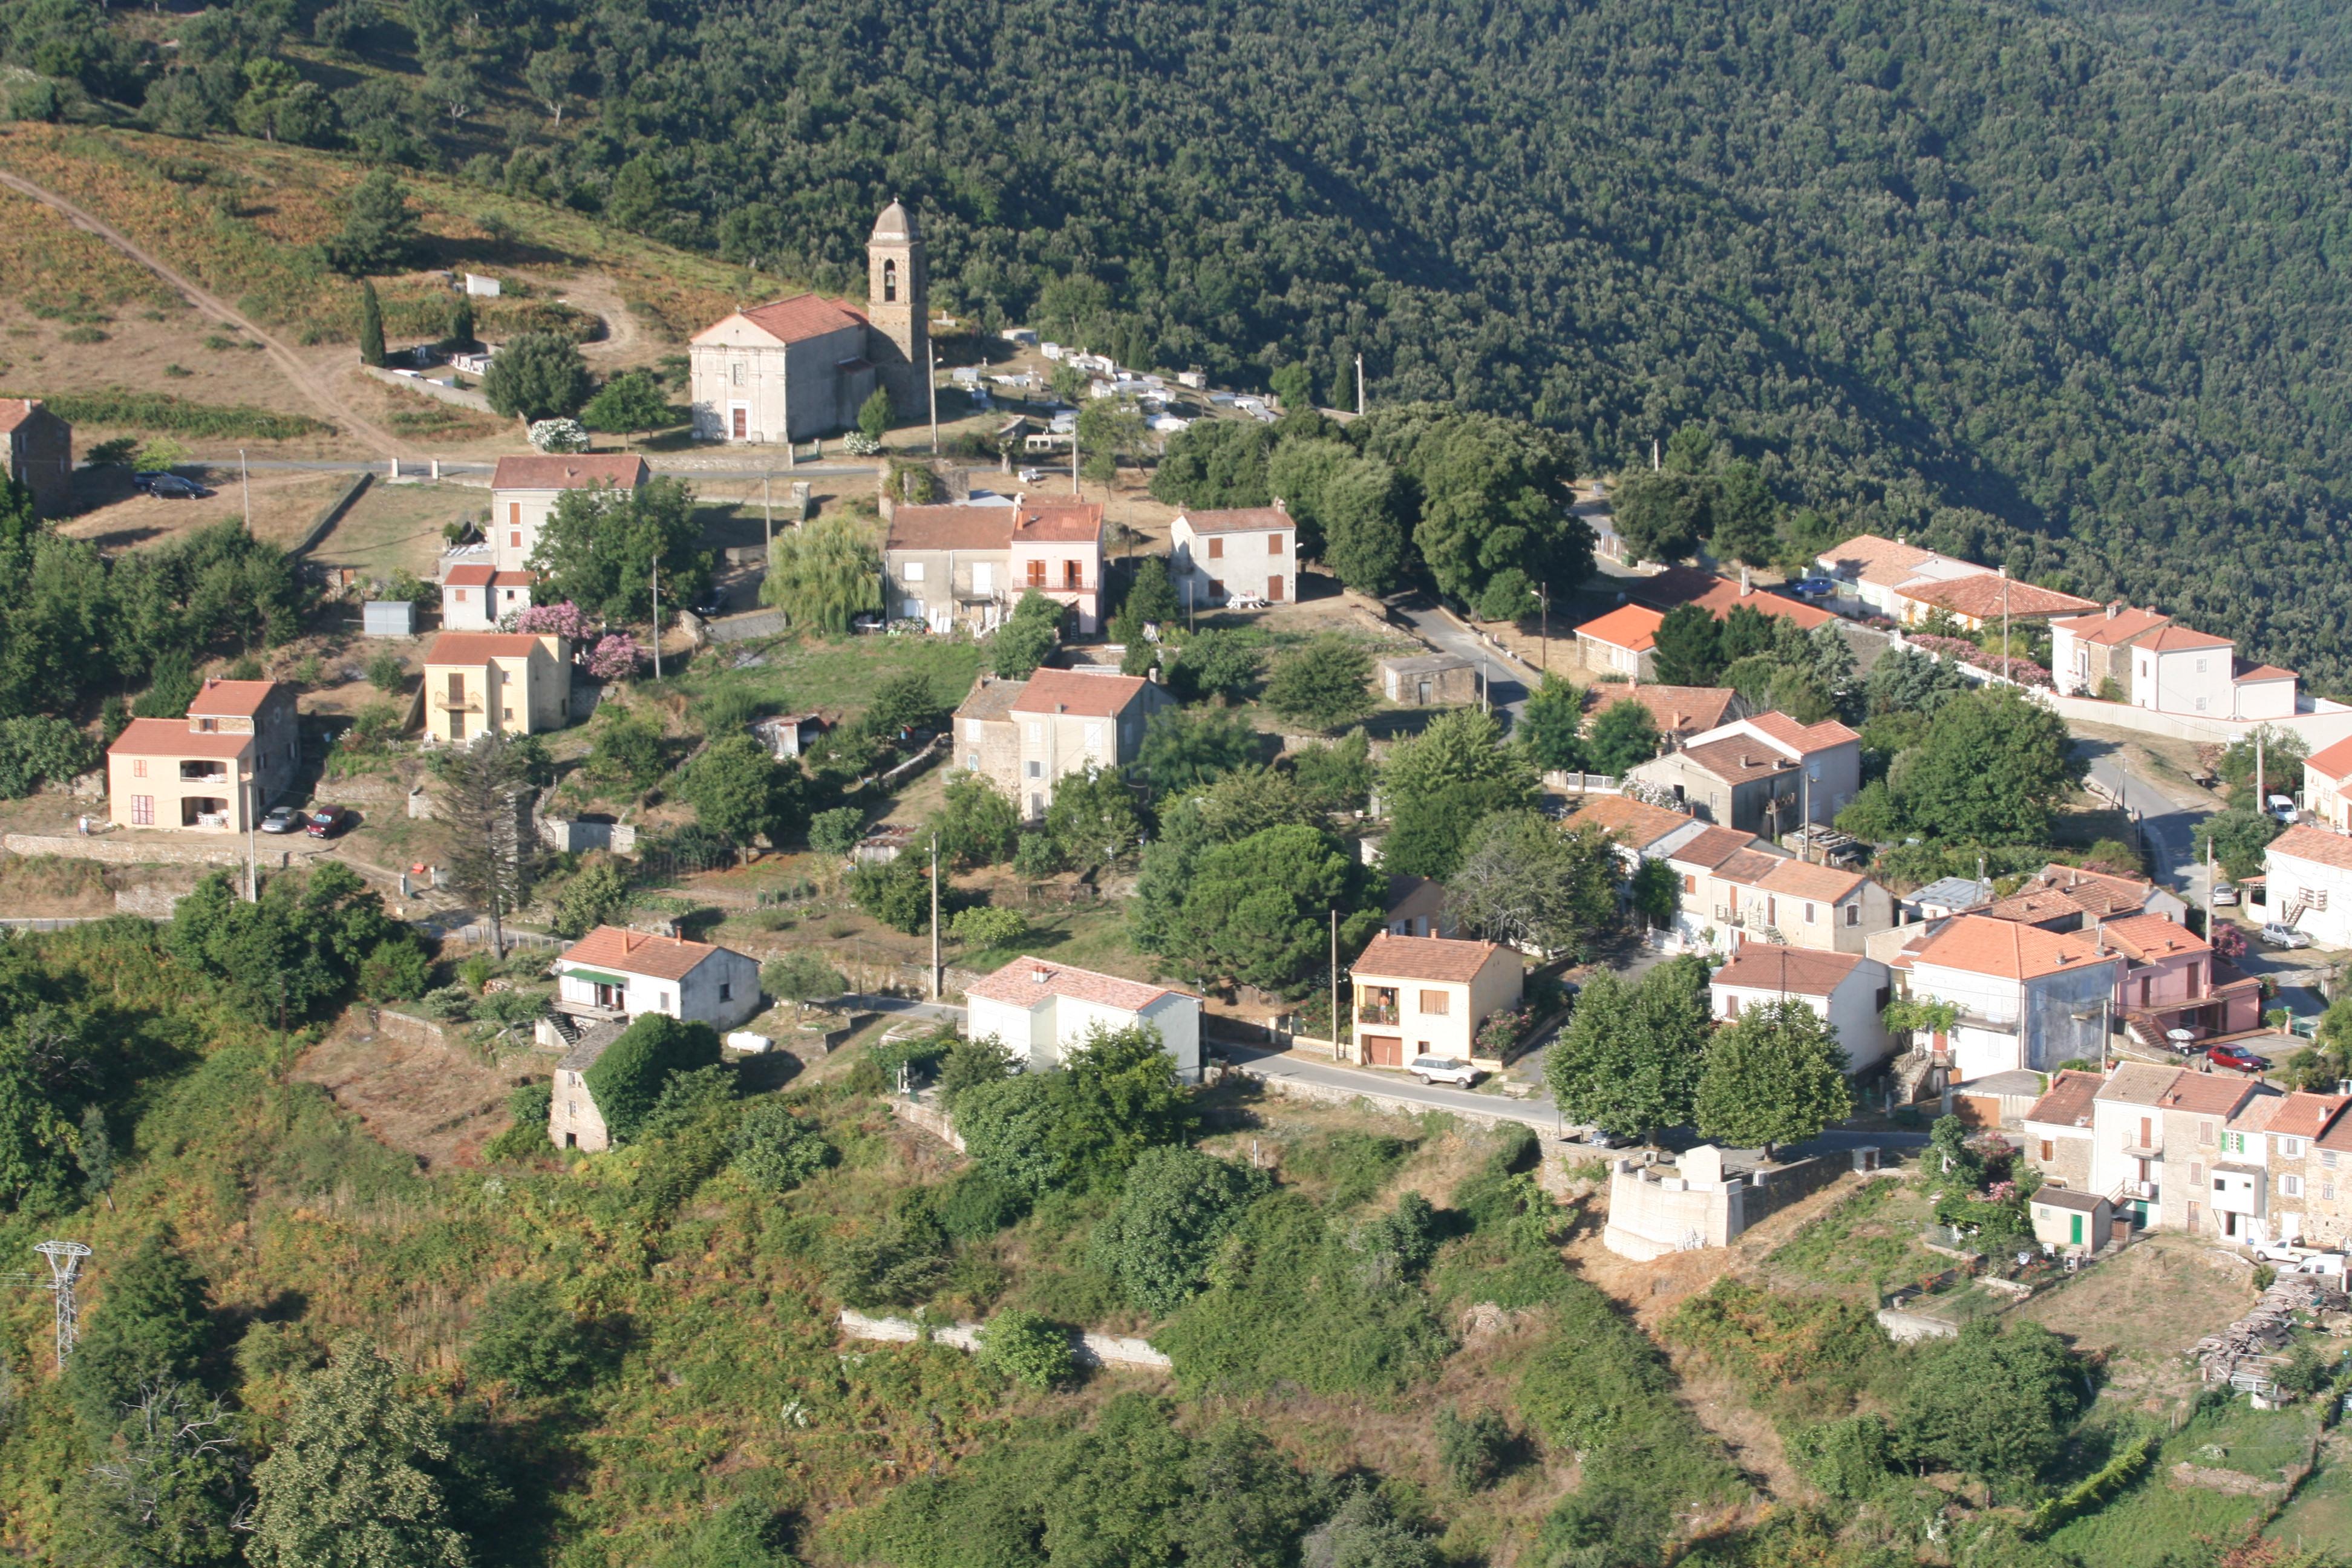 Le village de Serra di Fium'Orbu